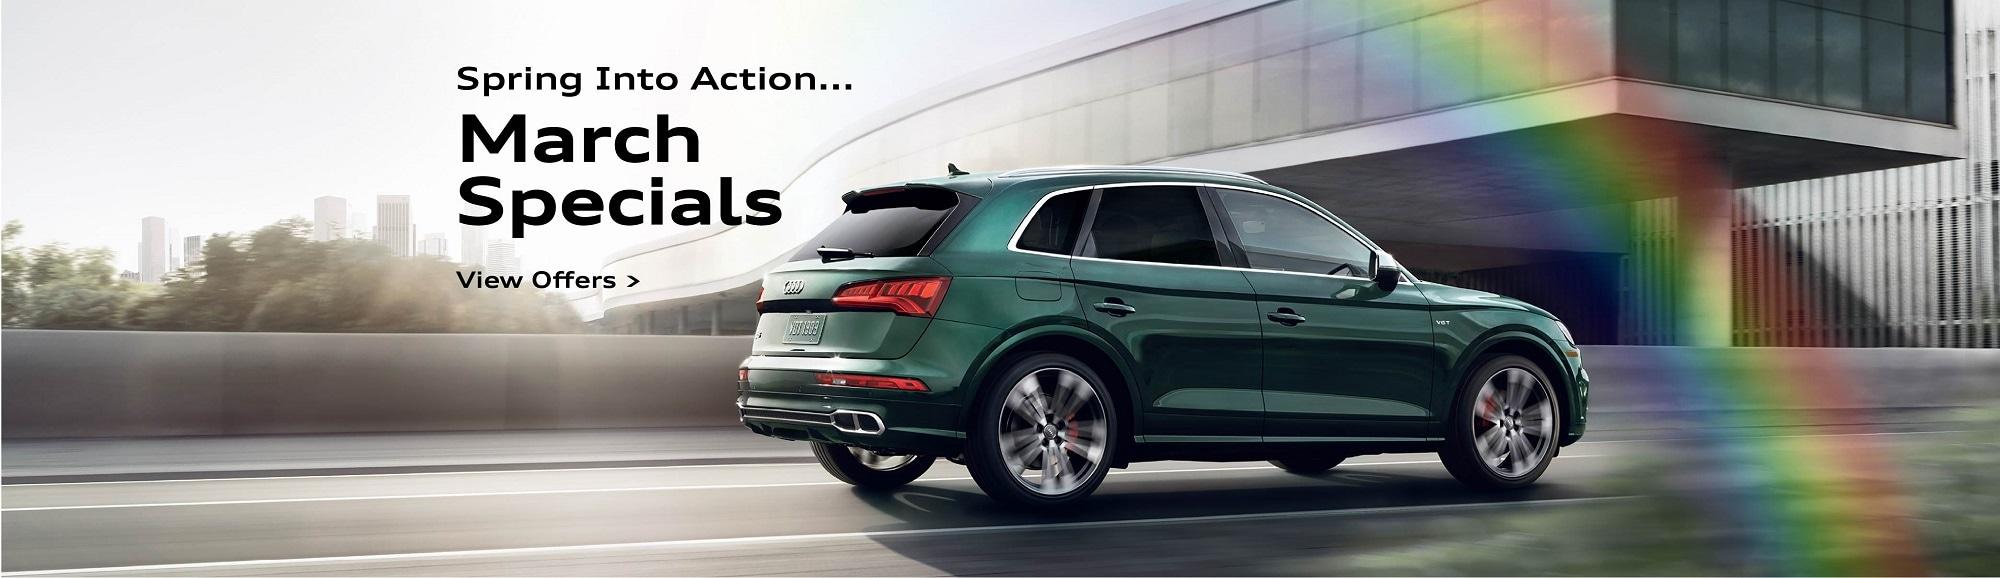 New Audi Used Car Dealer In Long Beach CA Circle Audi Serving - Southern california audi dealers